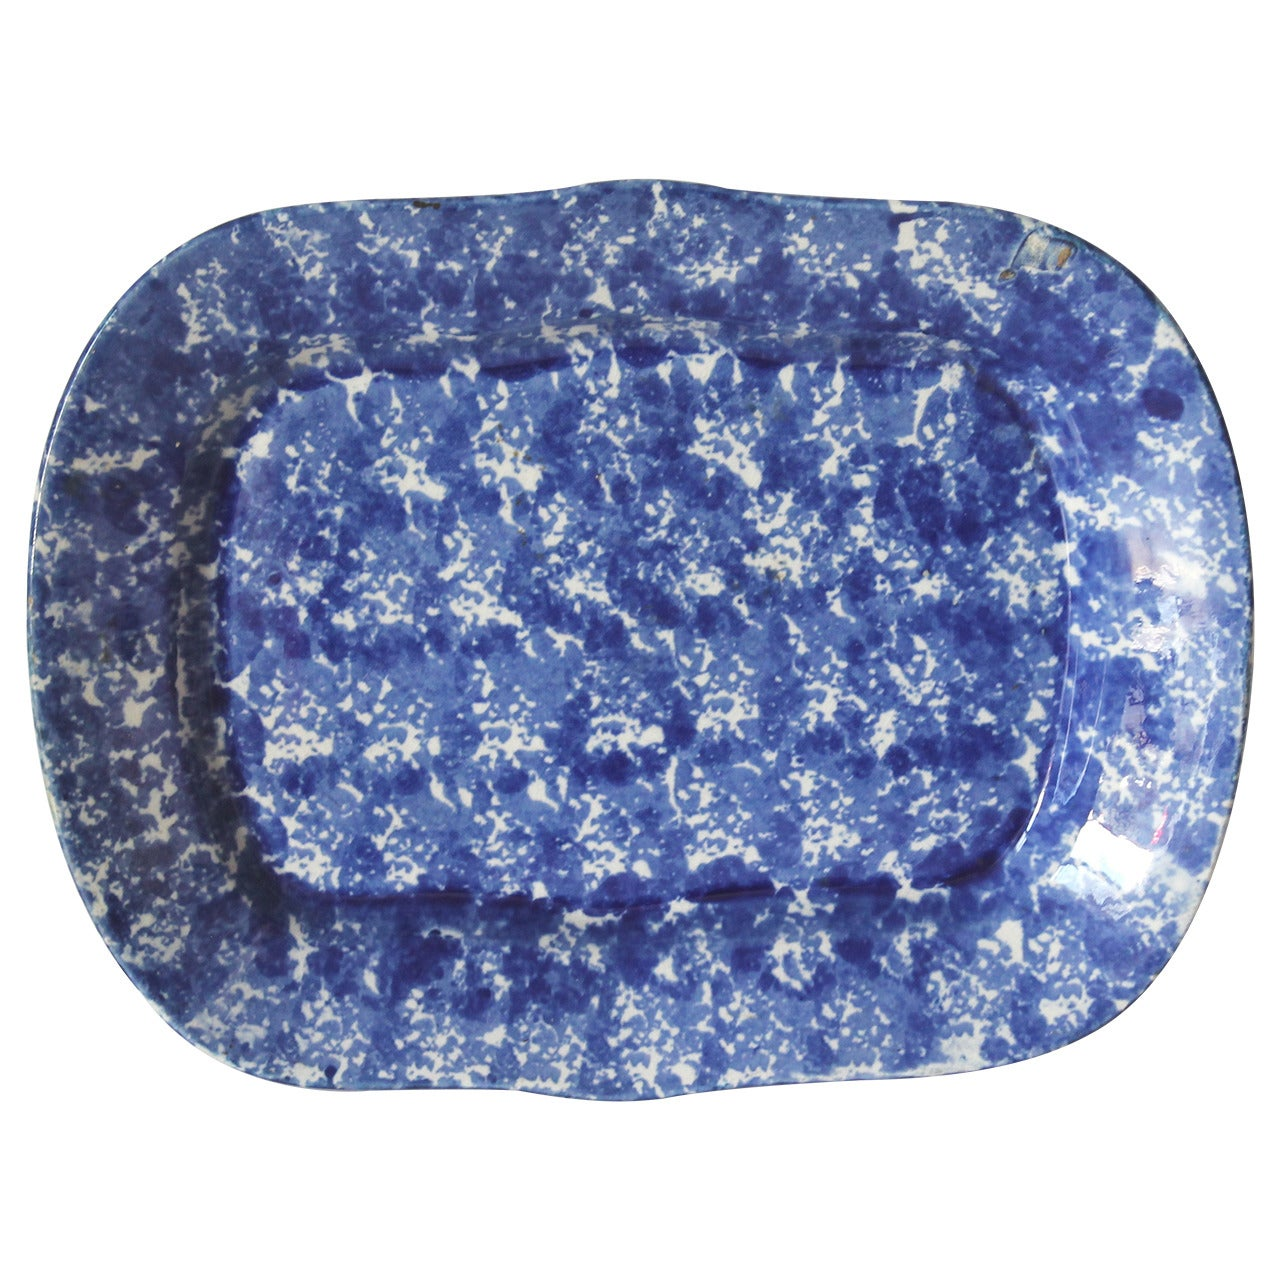 19th Century Monumental Sponge Ware Turkey Platter